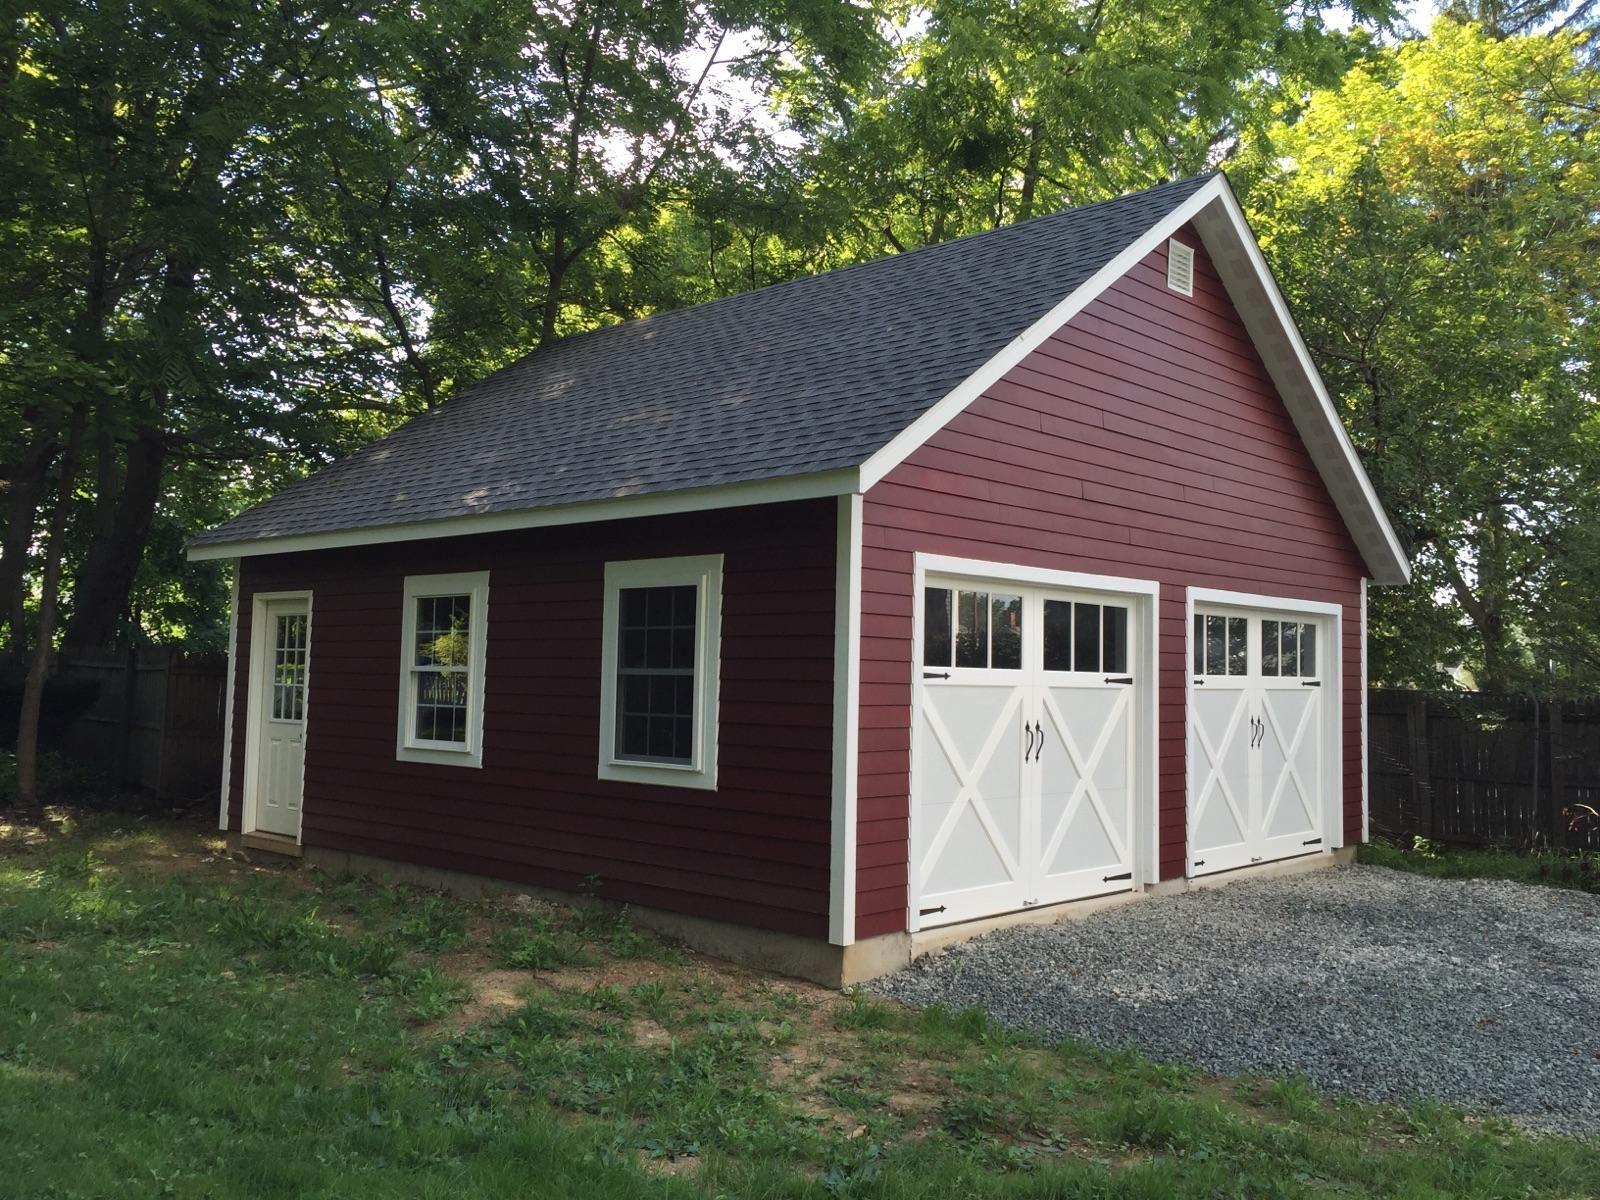 Garages Amish Garage 1 Car Garage 2 Car Garage 3 Car Garage Garaj